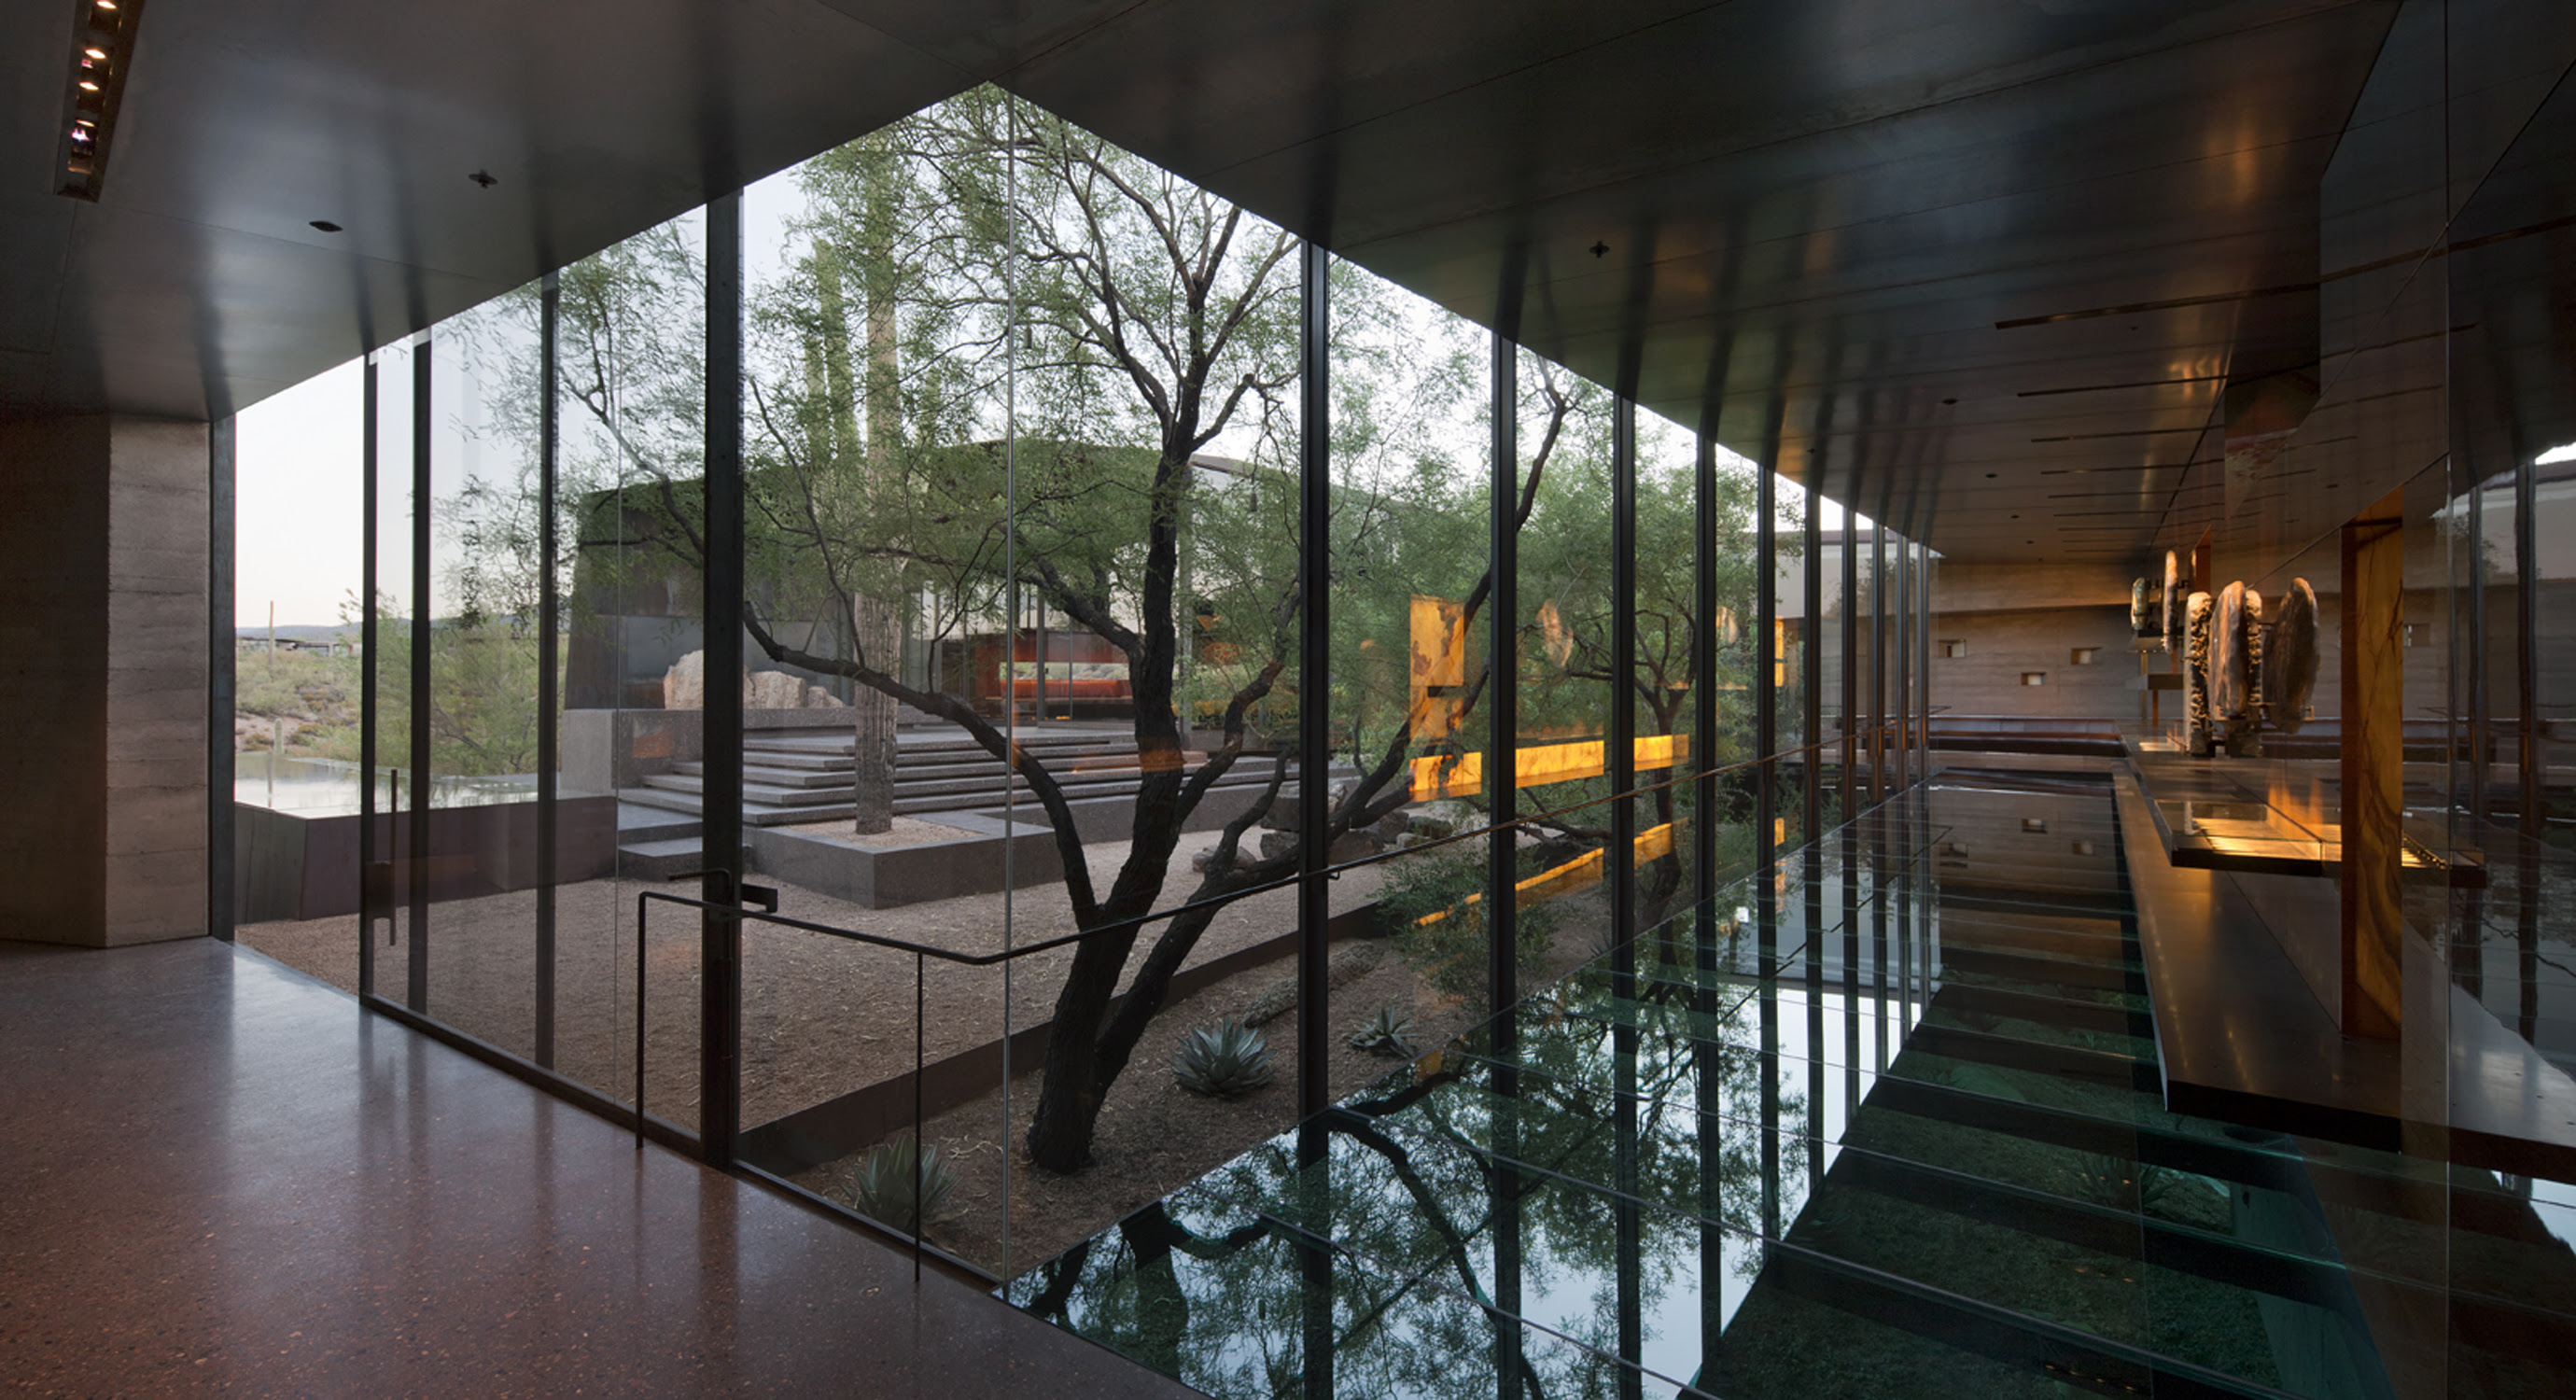 Arizona Architects Honored at AIA Awards Gala Saturday